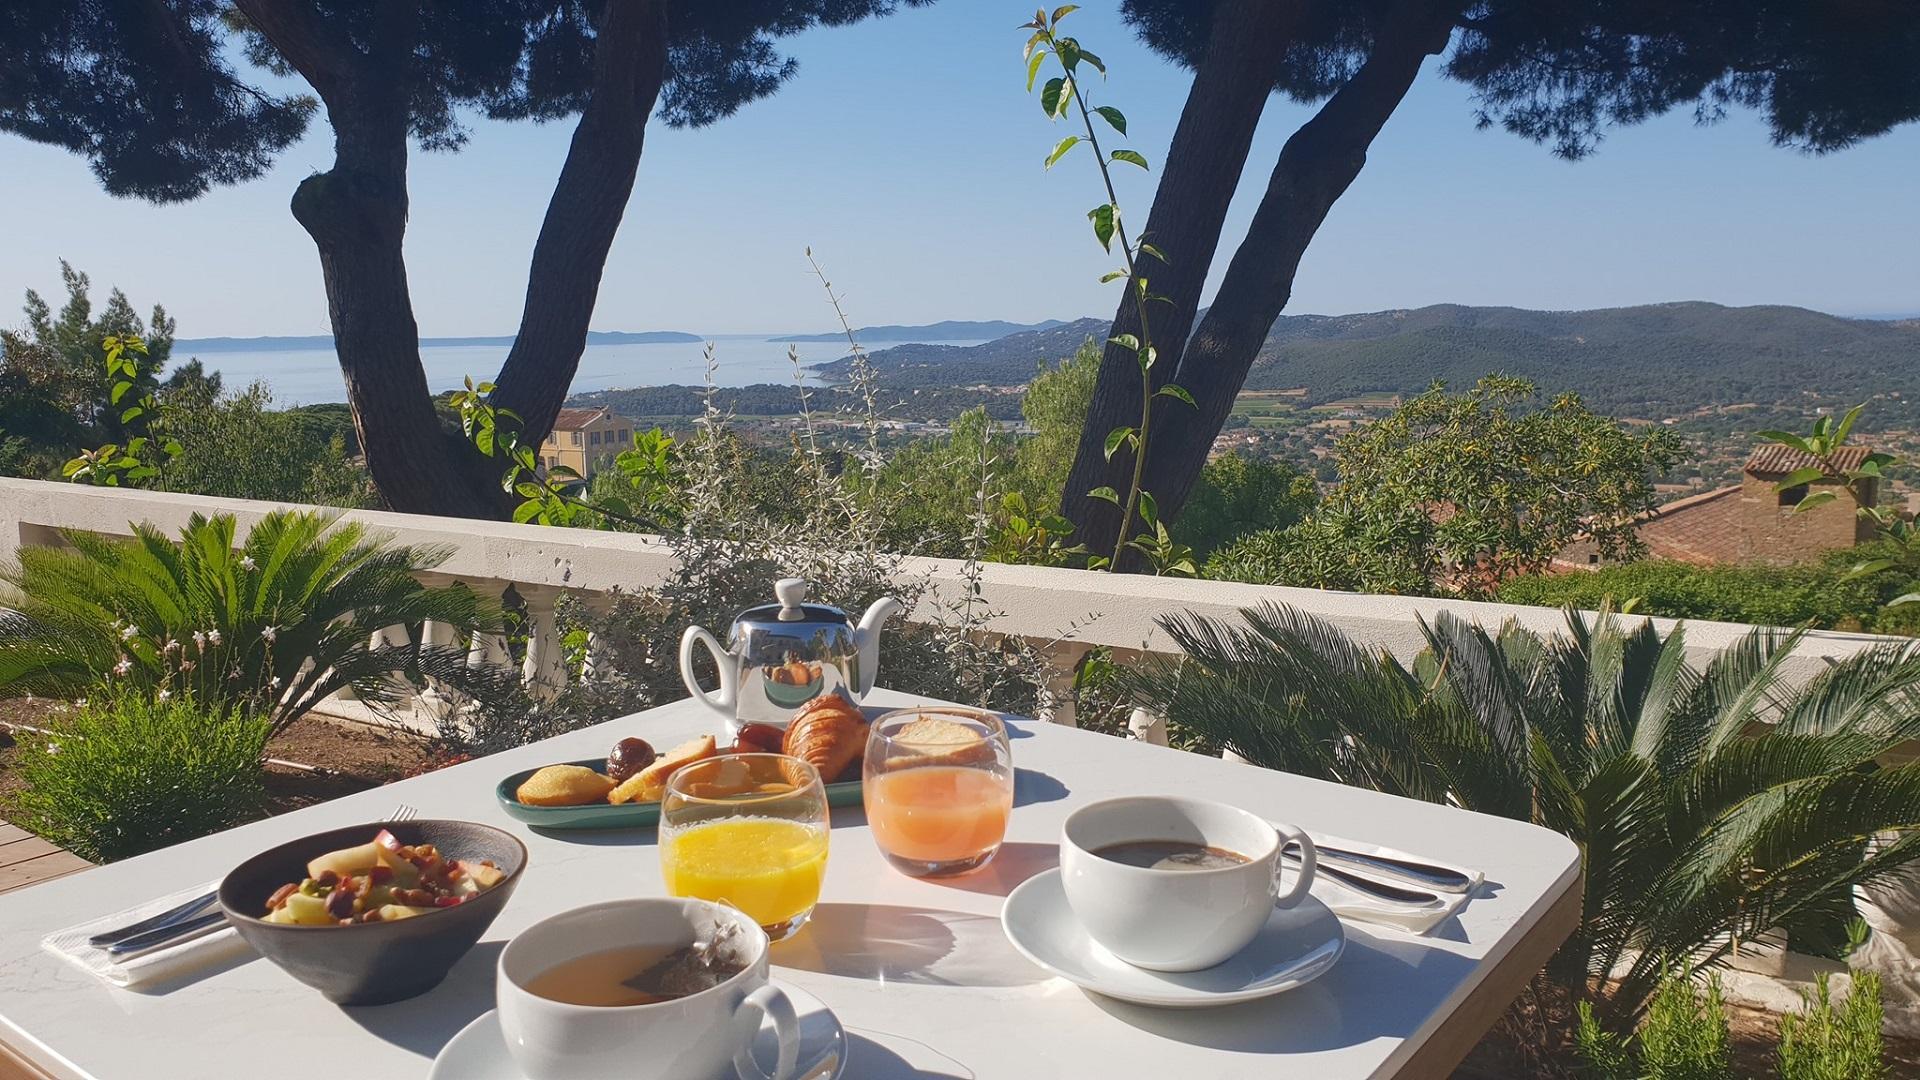 eden-rose-grand-hotel-bormes-les-mimosas-paca-cote-azur-nature-seminaire